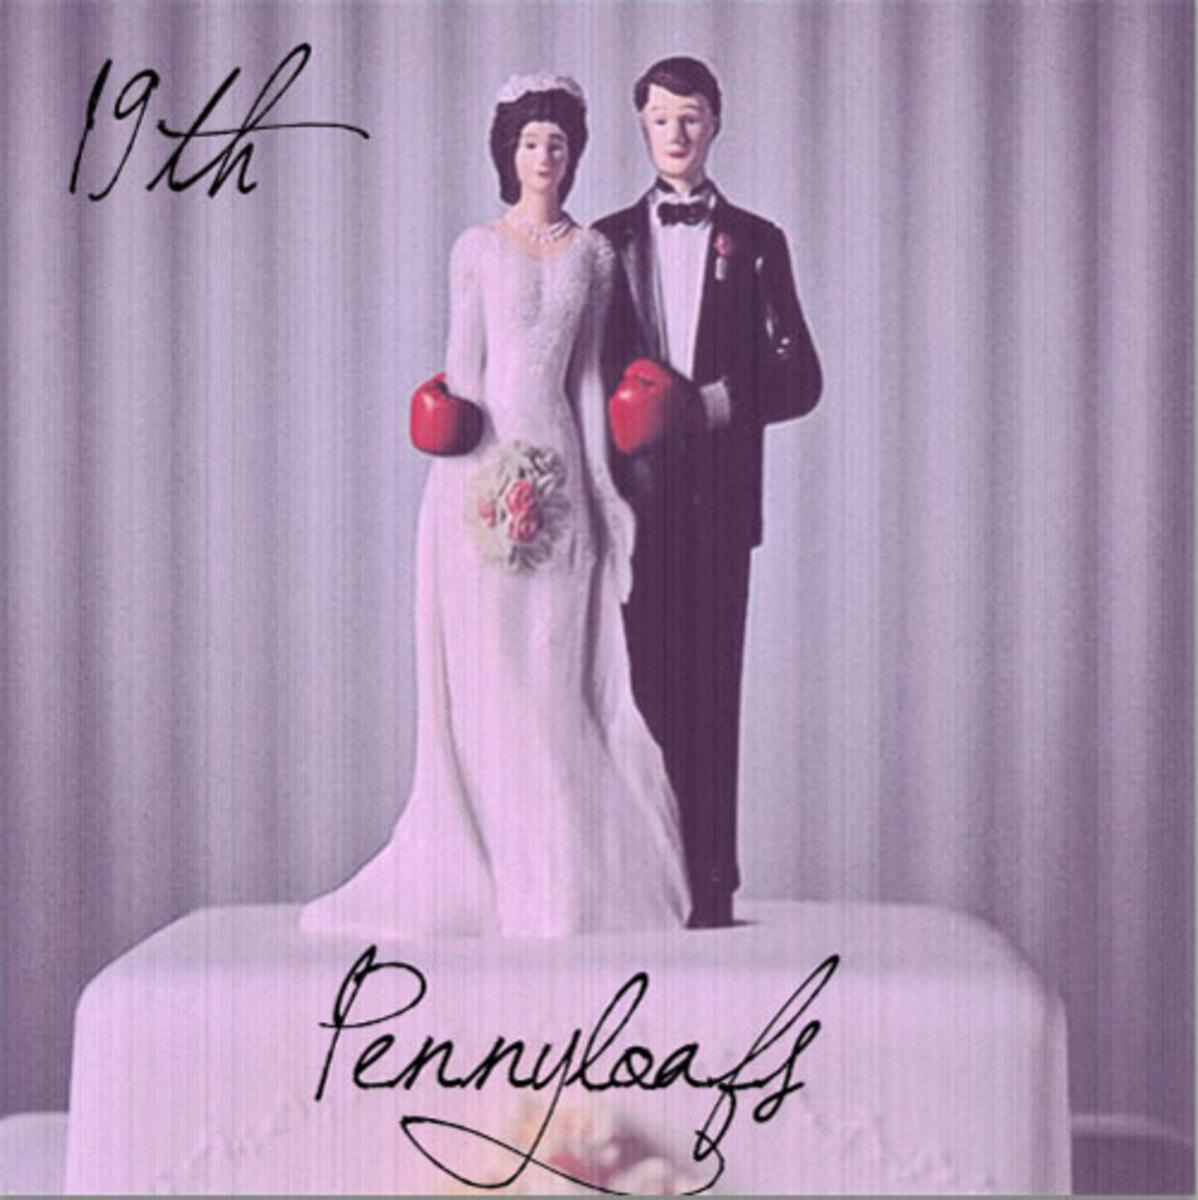 pennyloafs-19th.jpg